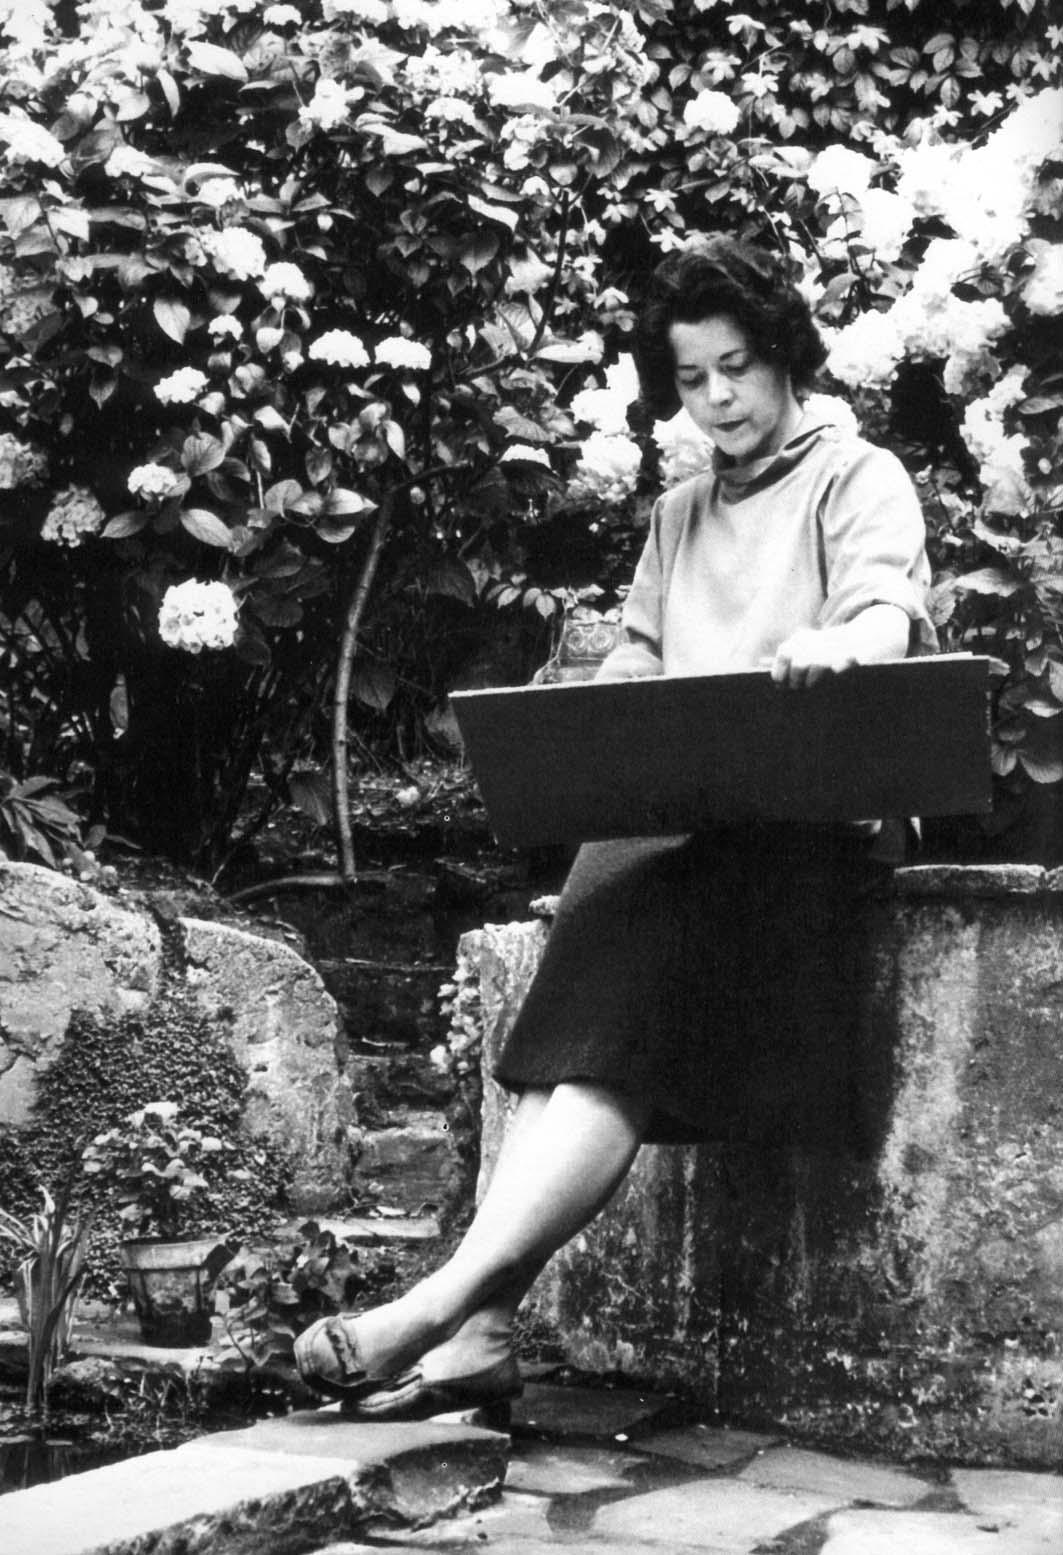 Thelma Hulbert by Eileen Tweedy, Holland Park, 1960s